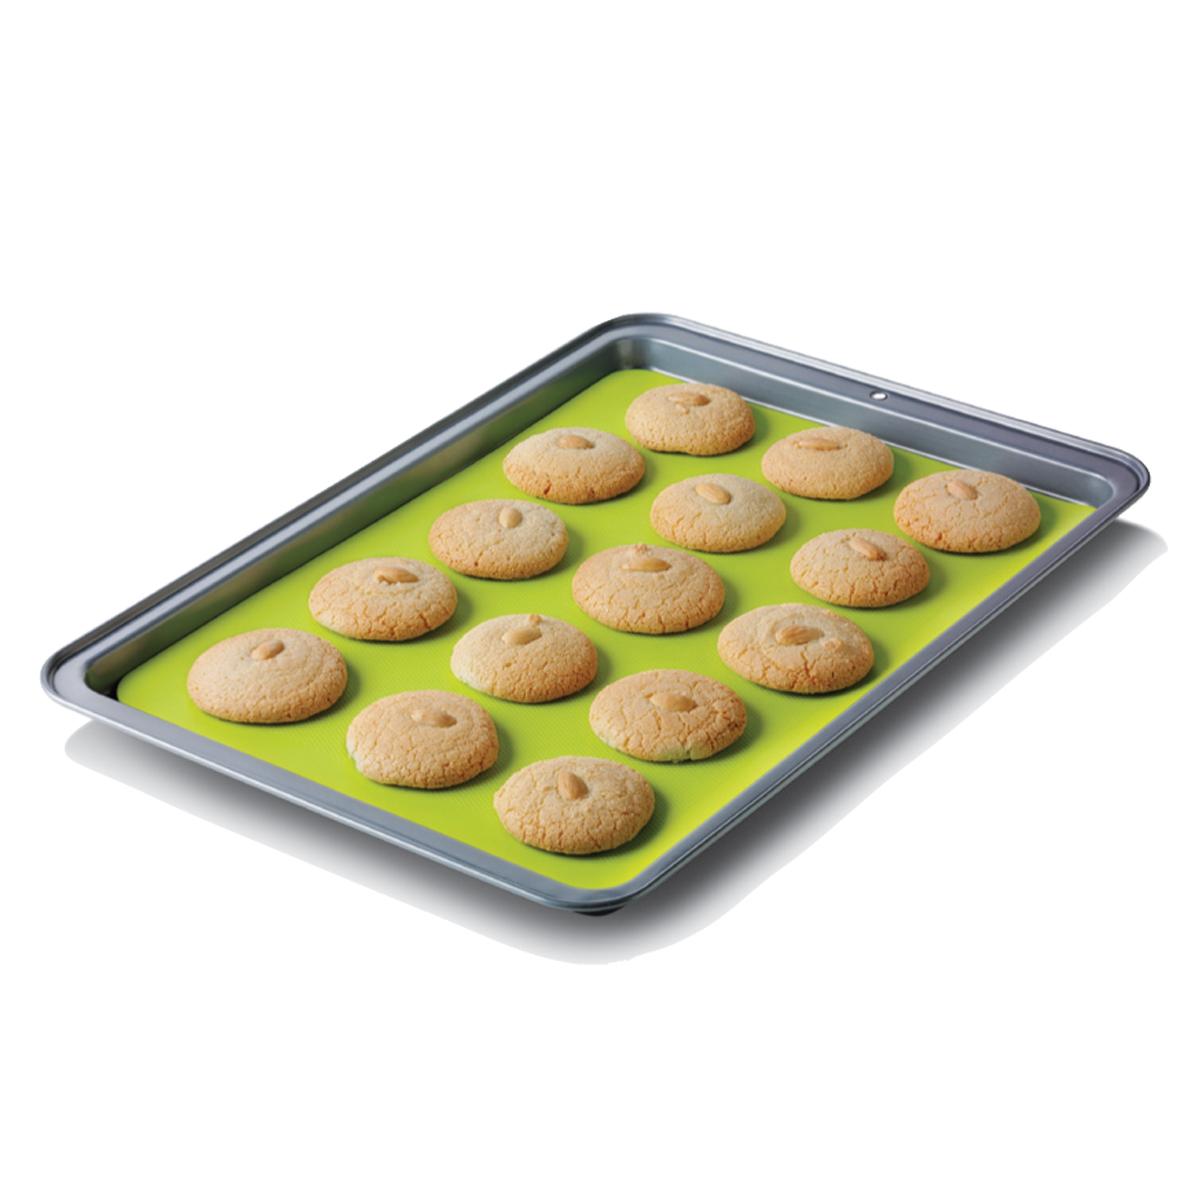 Non Stick Silicone Baking Sheet